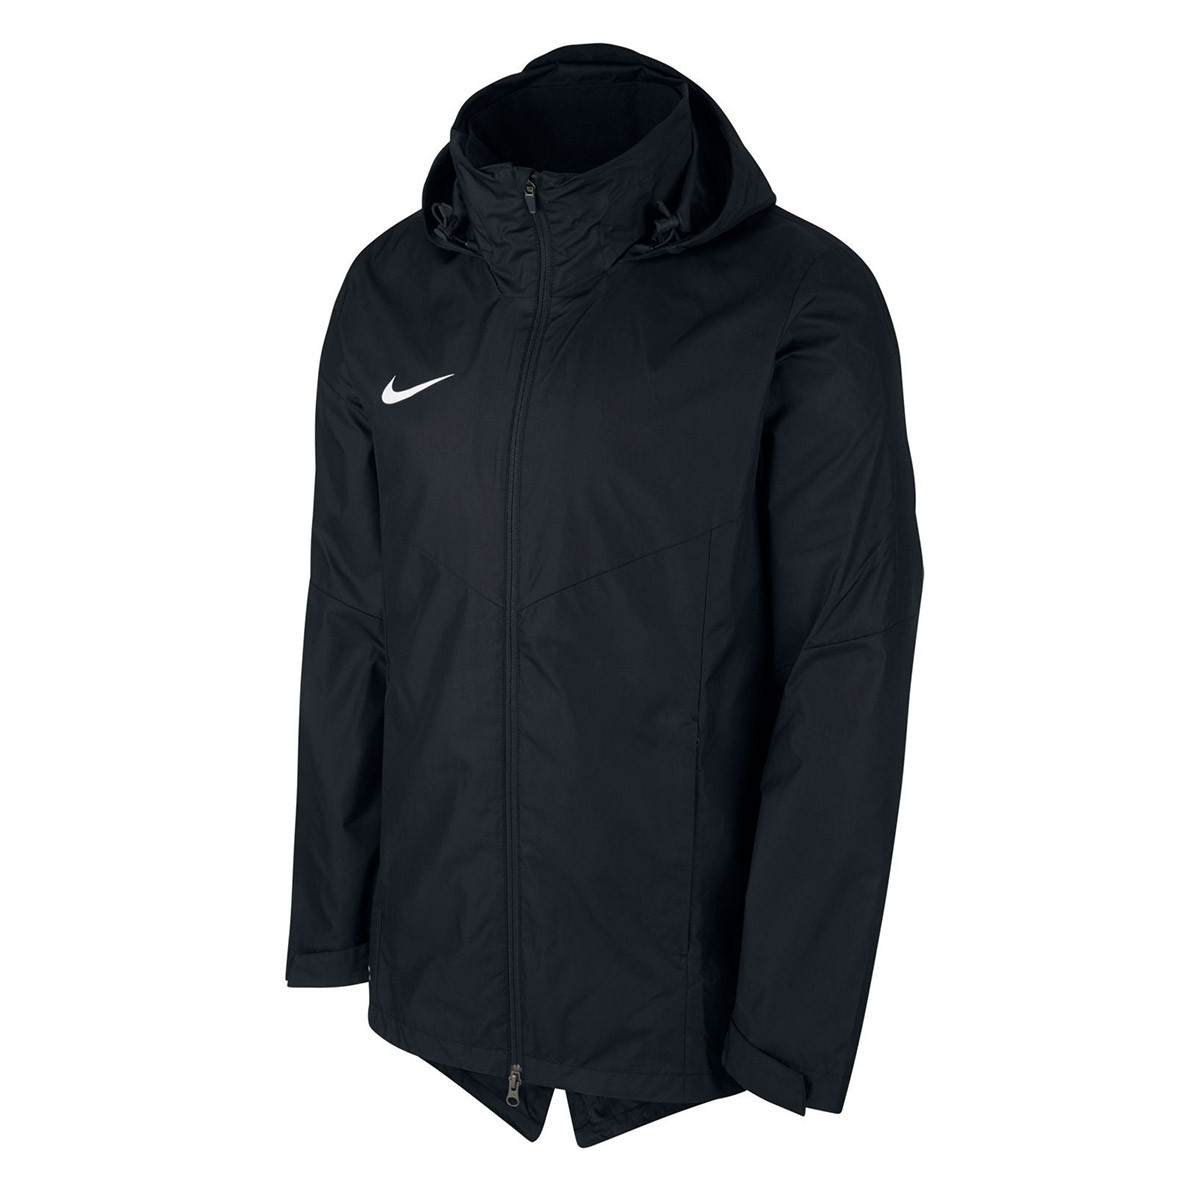 Puntero batalla desvanecerse  Raincoat Nike Academy 18 Black-White - Football store Fútbol Emotion